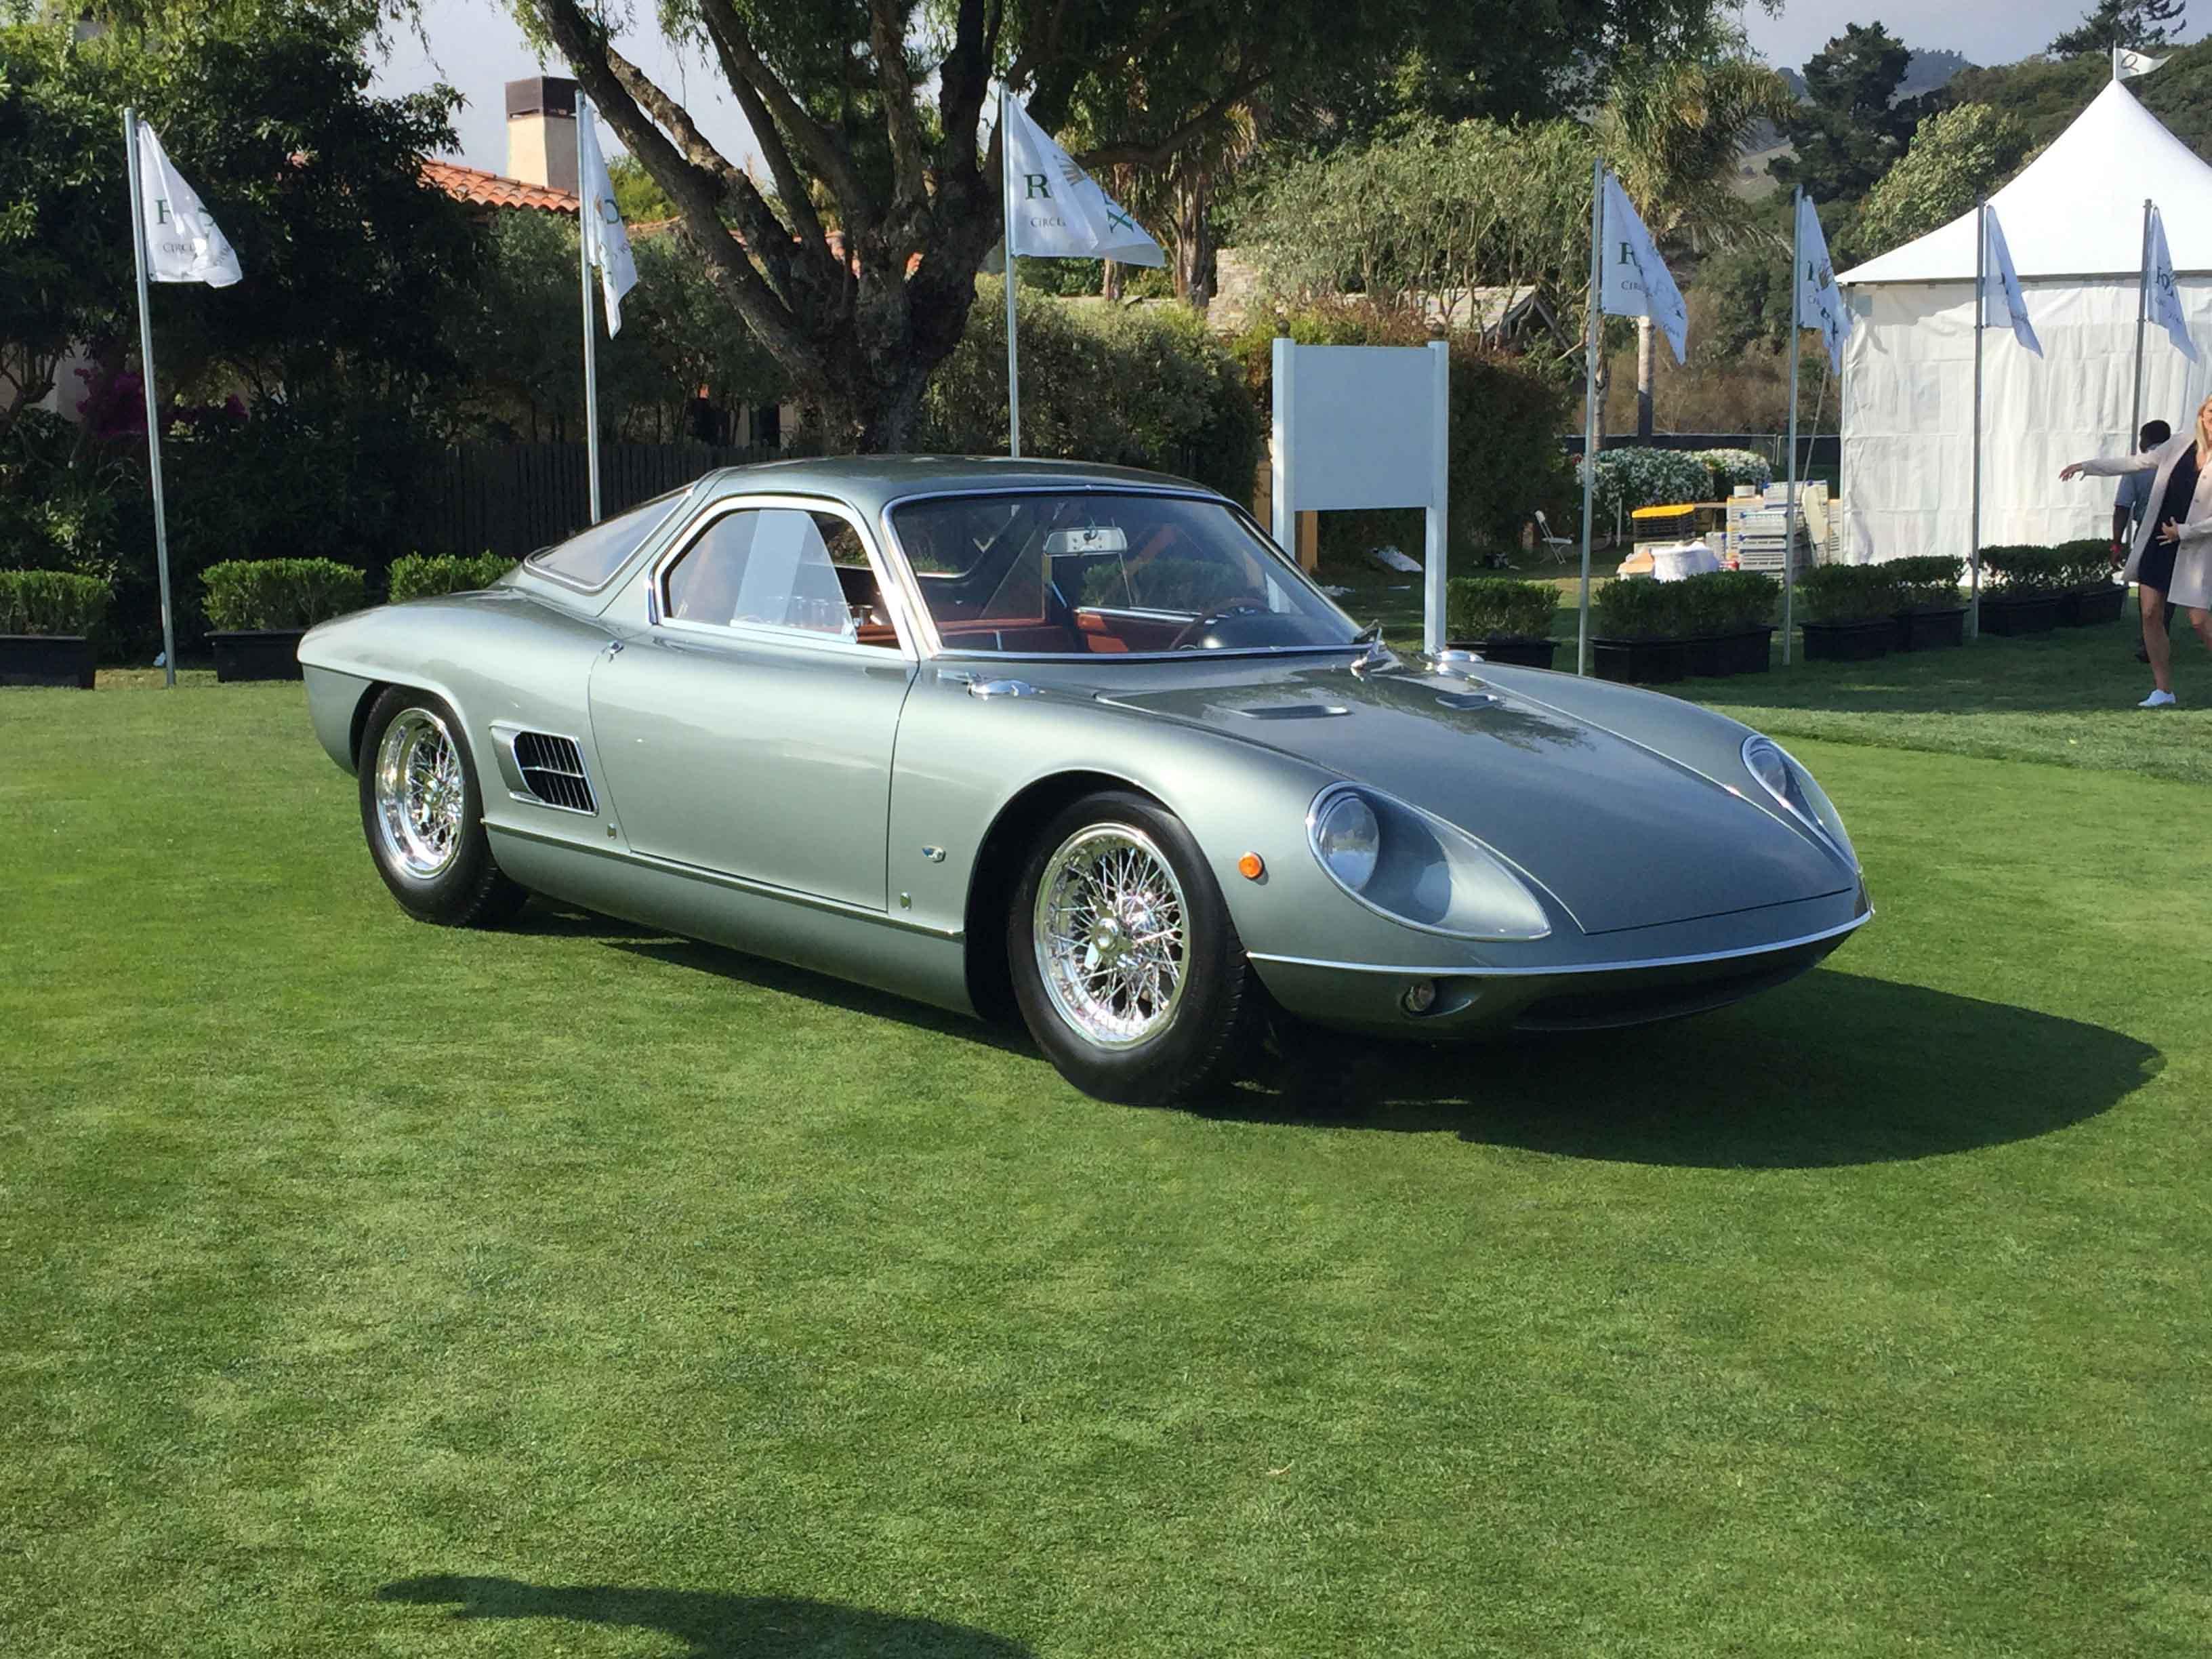 autos clásicos, Peninsula Classics Best of the Best Award, 1964 ATS 2500 GTS Coupé by Allemano